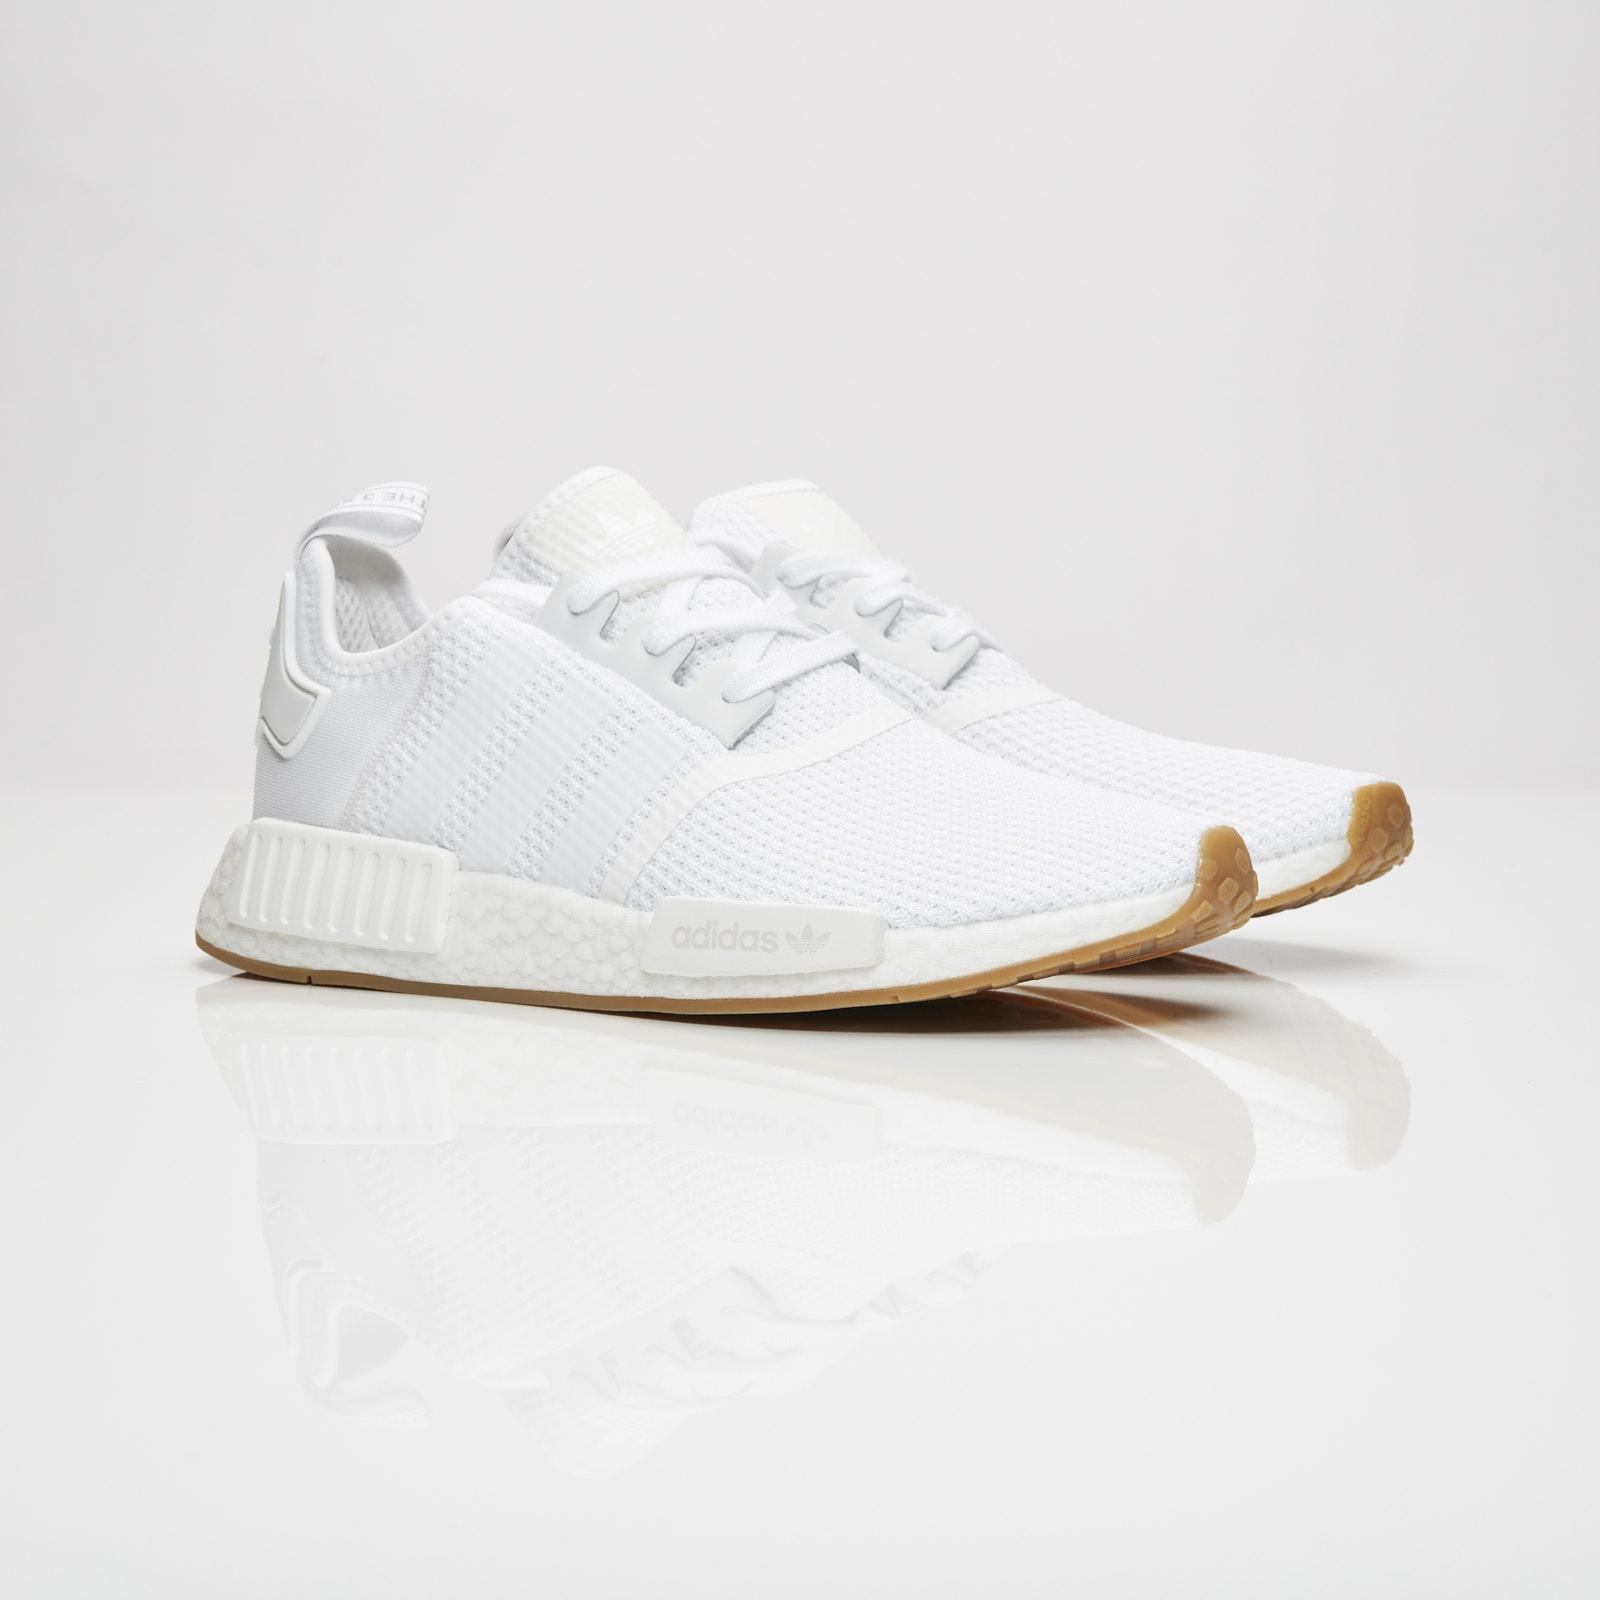 adidas NMD R1 - D96635 - Sneakersnstuff